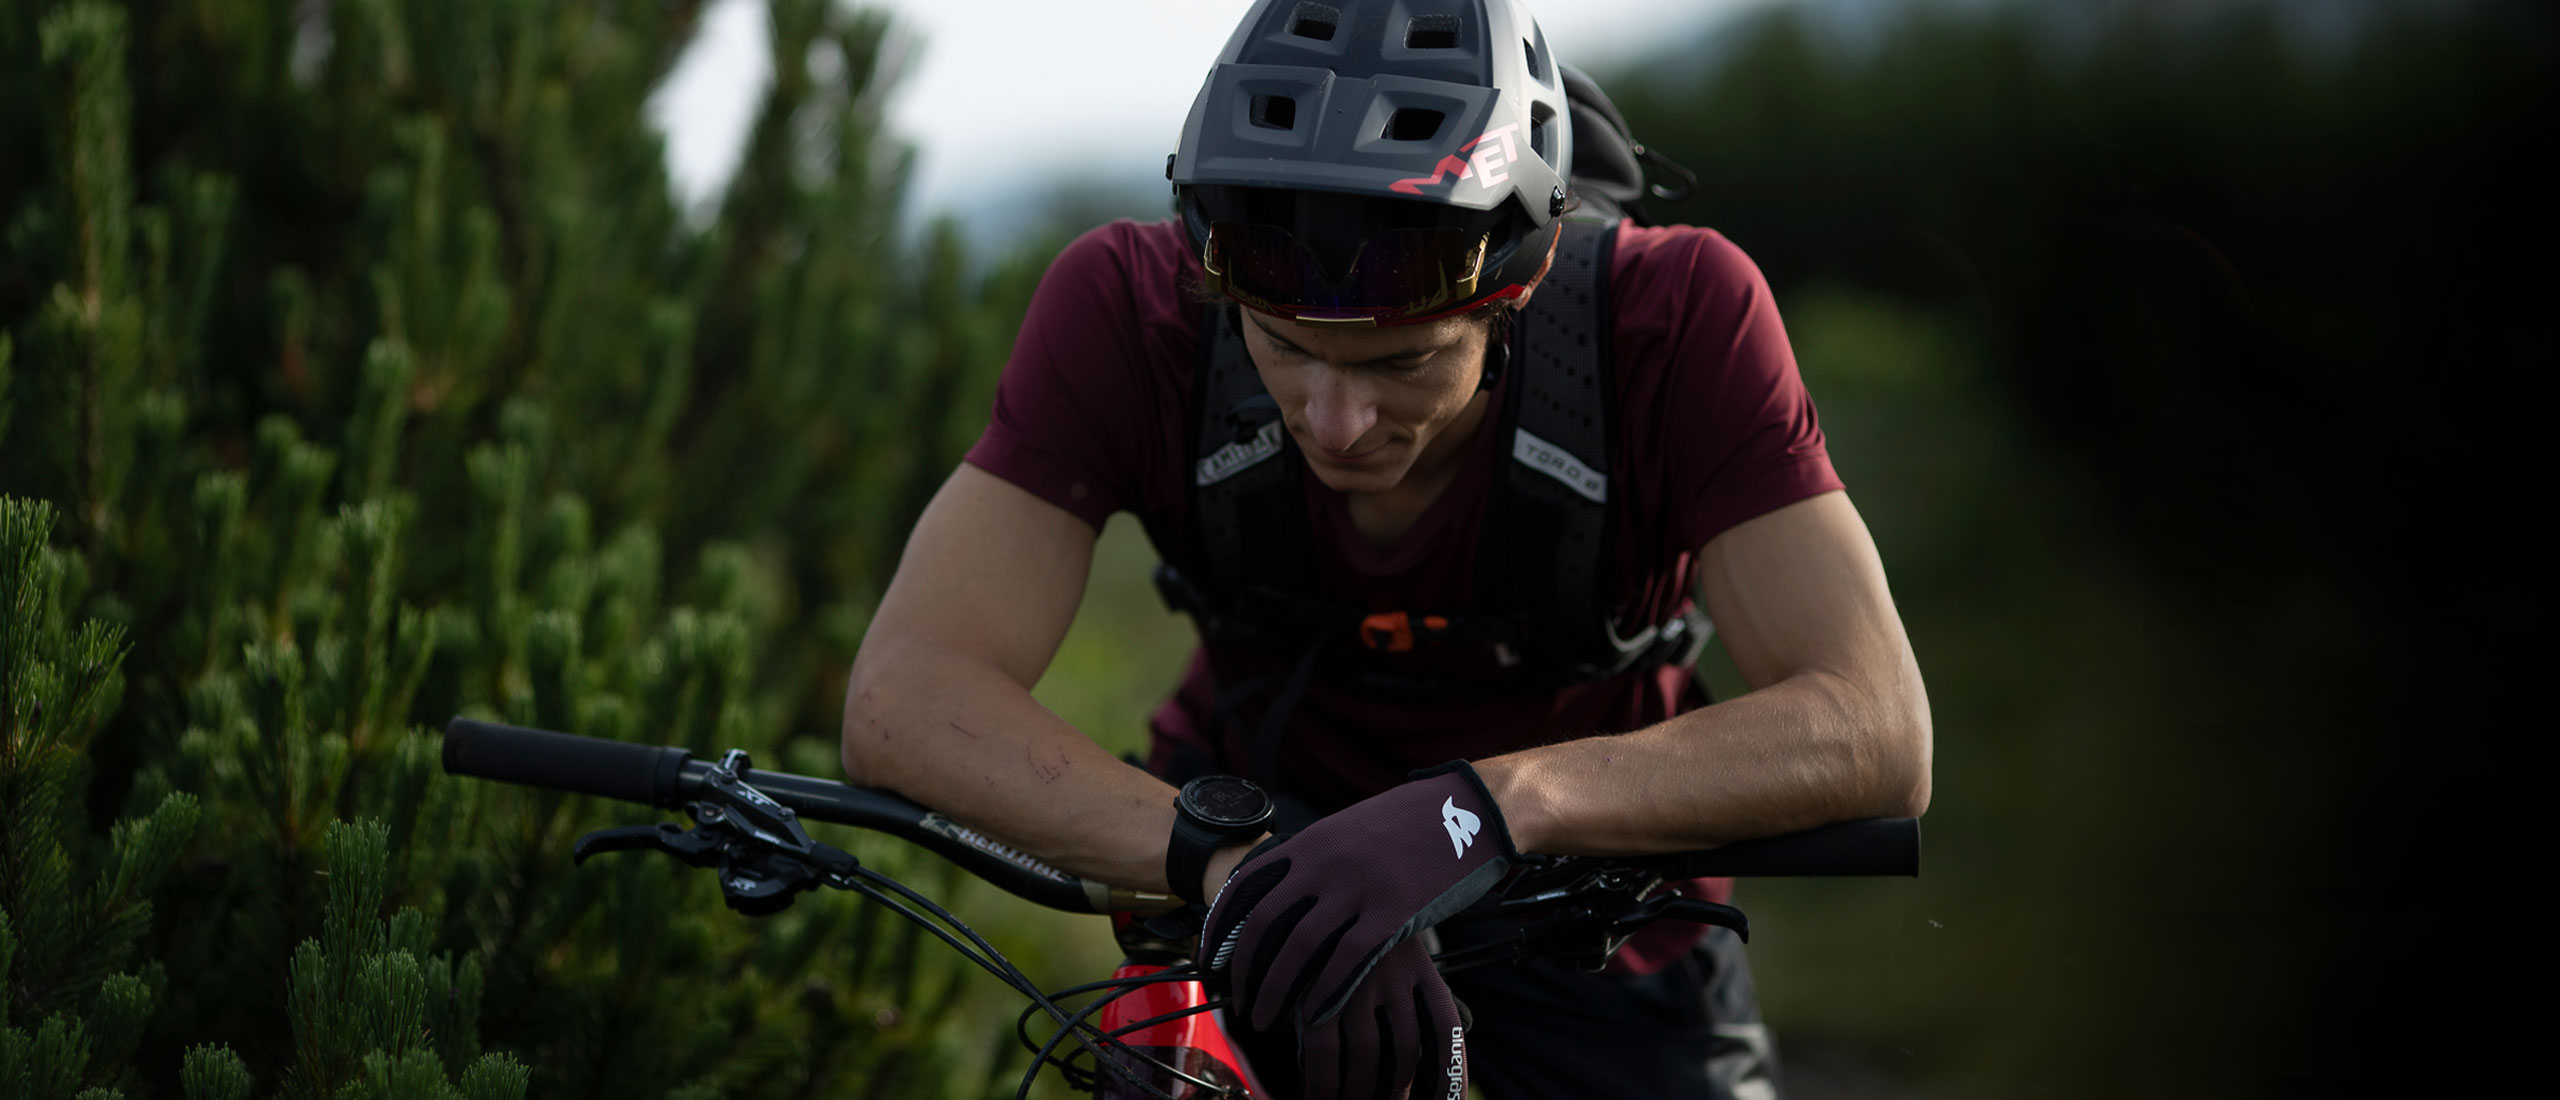 BLUEGRASS Magnete Lite Gloves made for Mountain Bike, Enduro and E-Bike